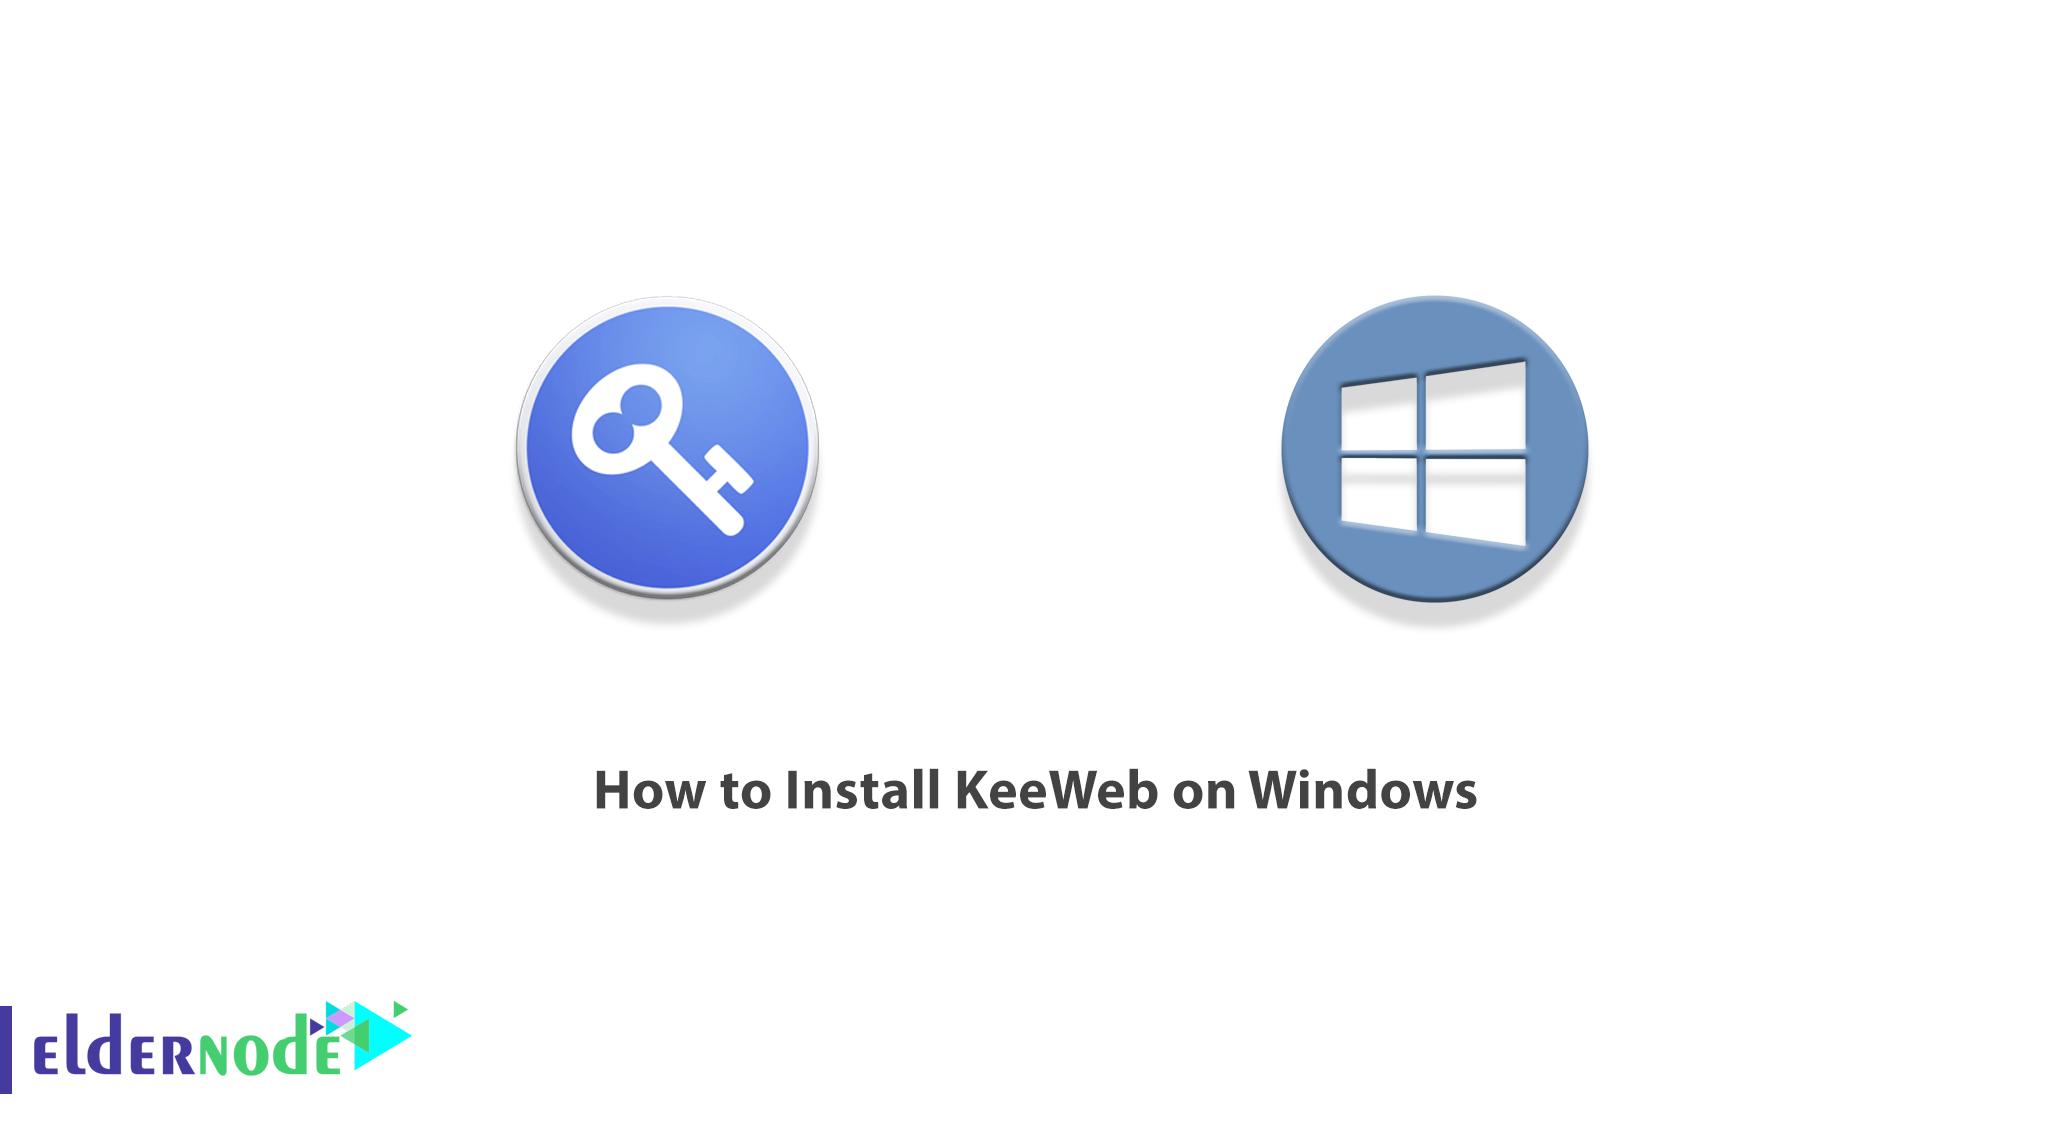 How to Install KeeWeb on Windows